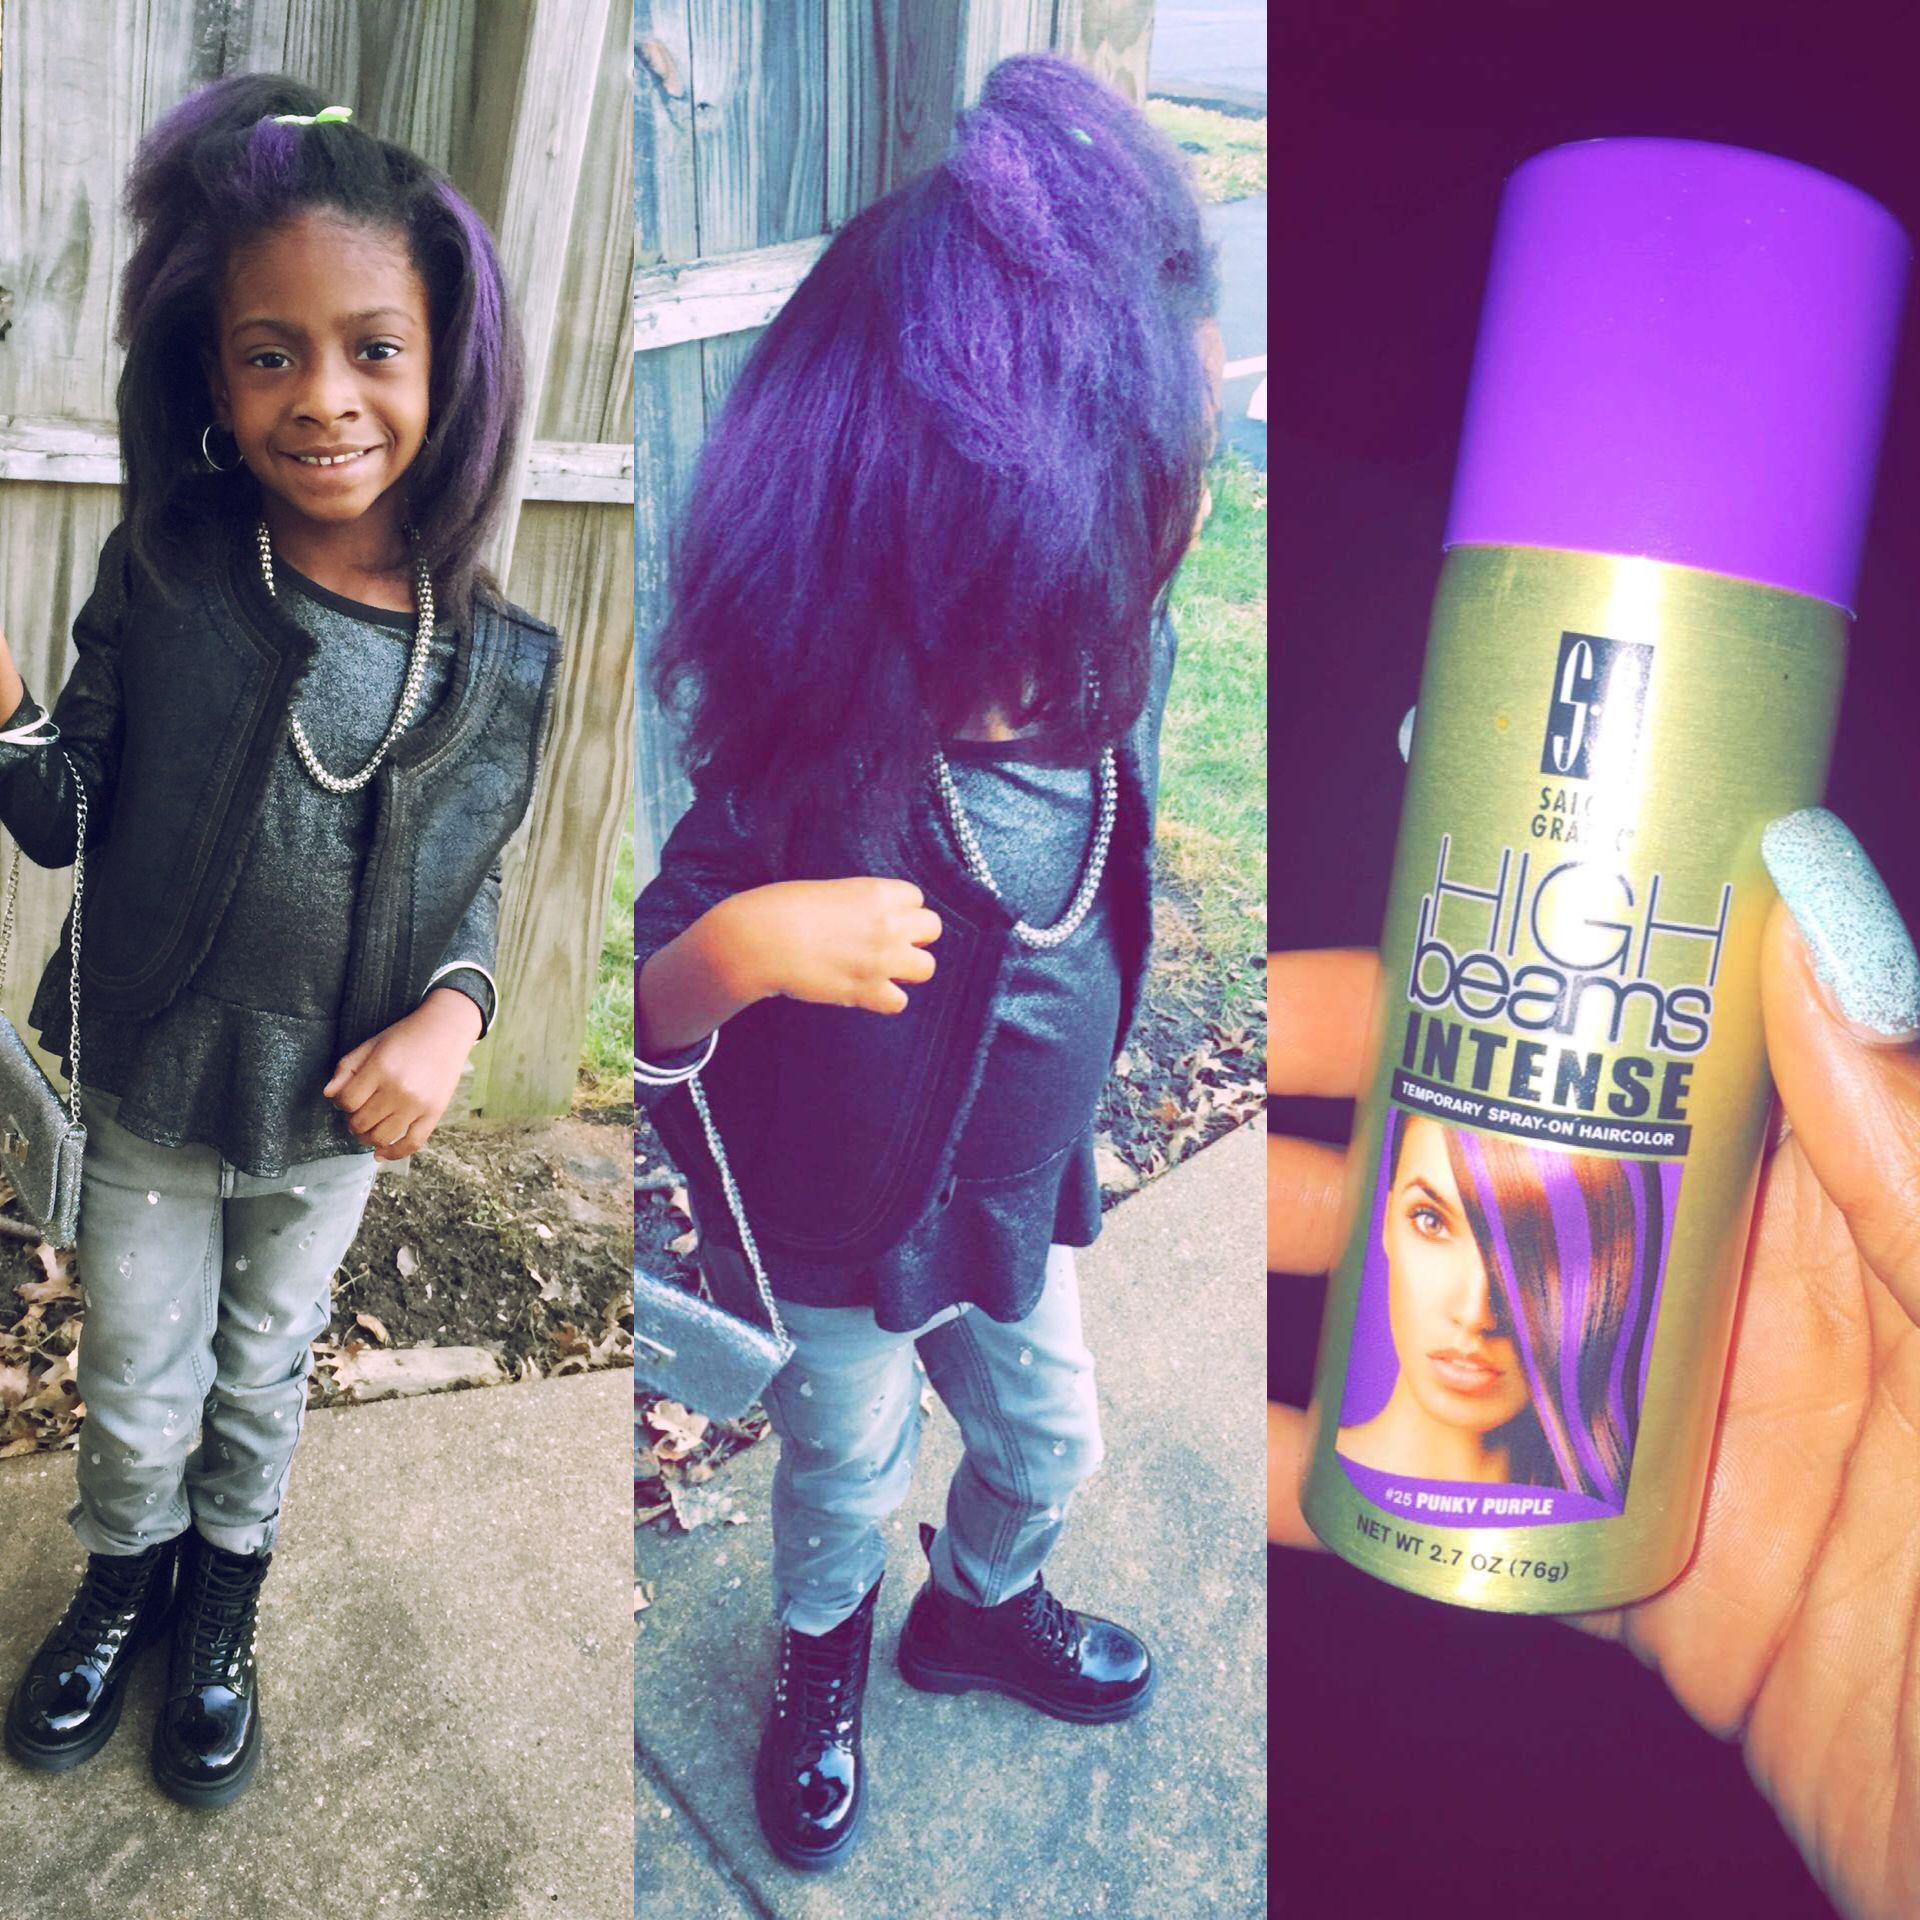 Little black girls hairstyles Hairspray Purple Straight hair ...